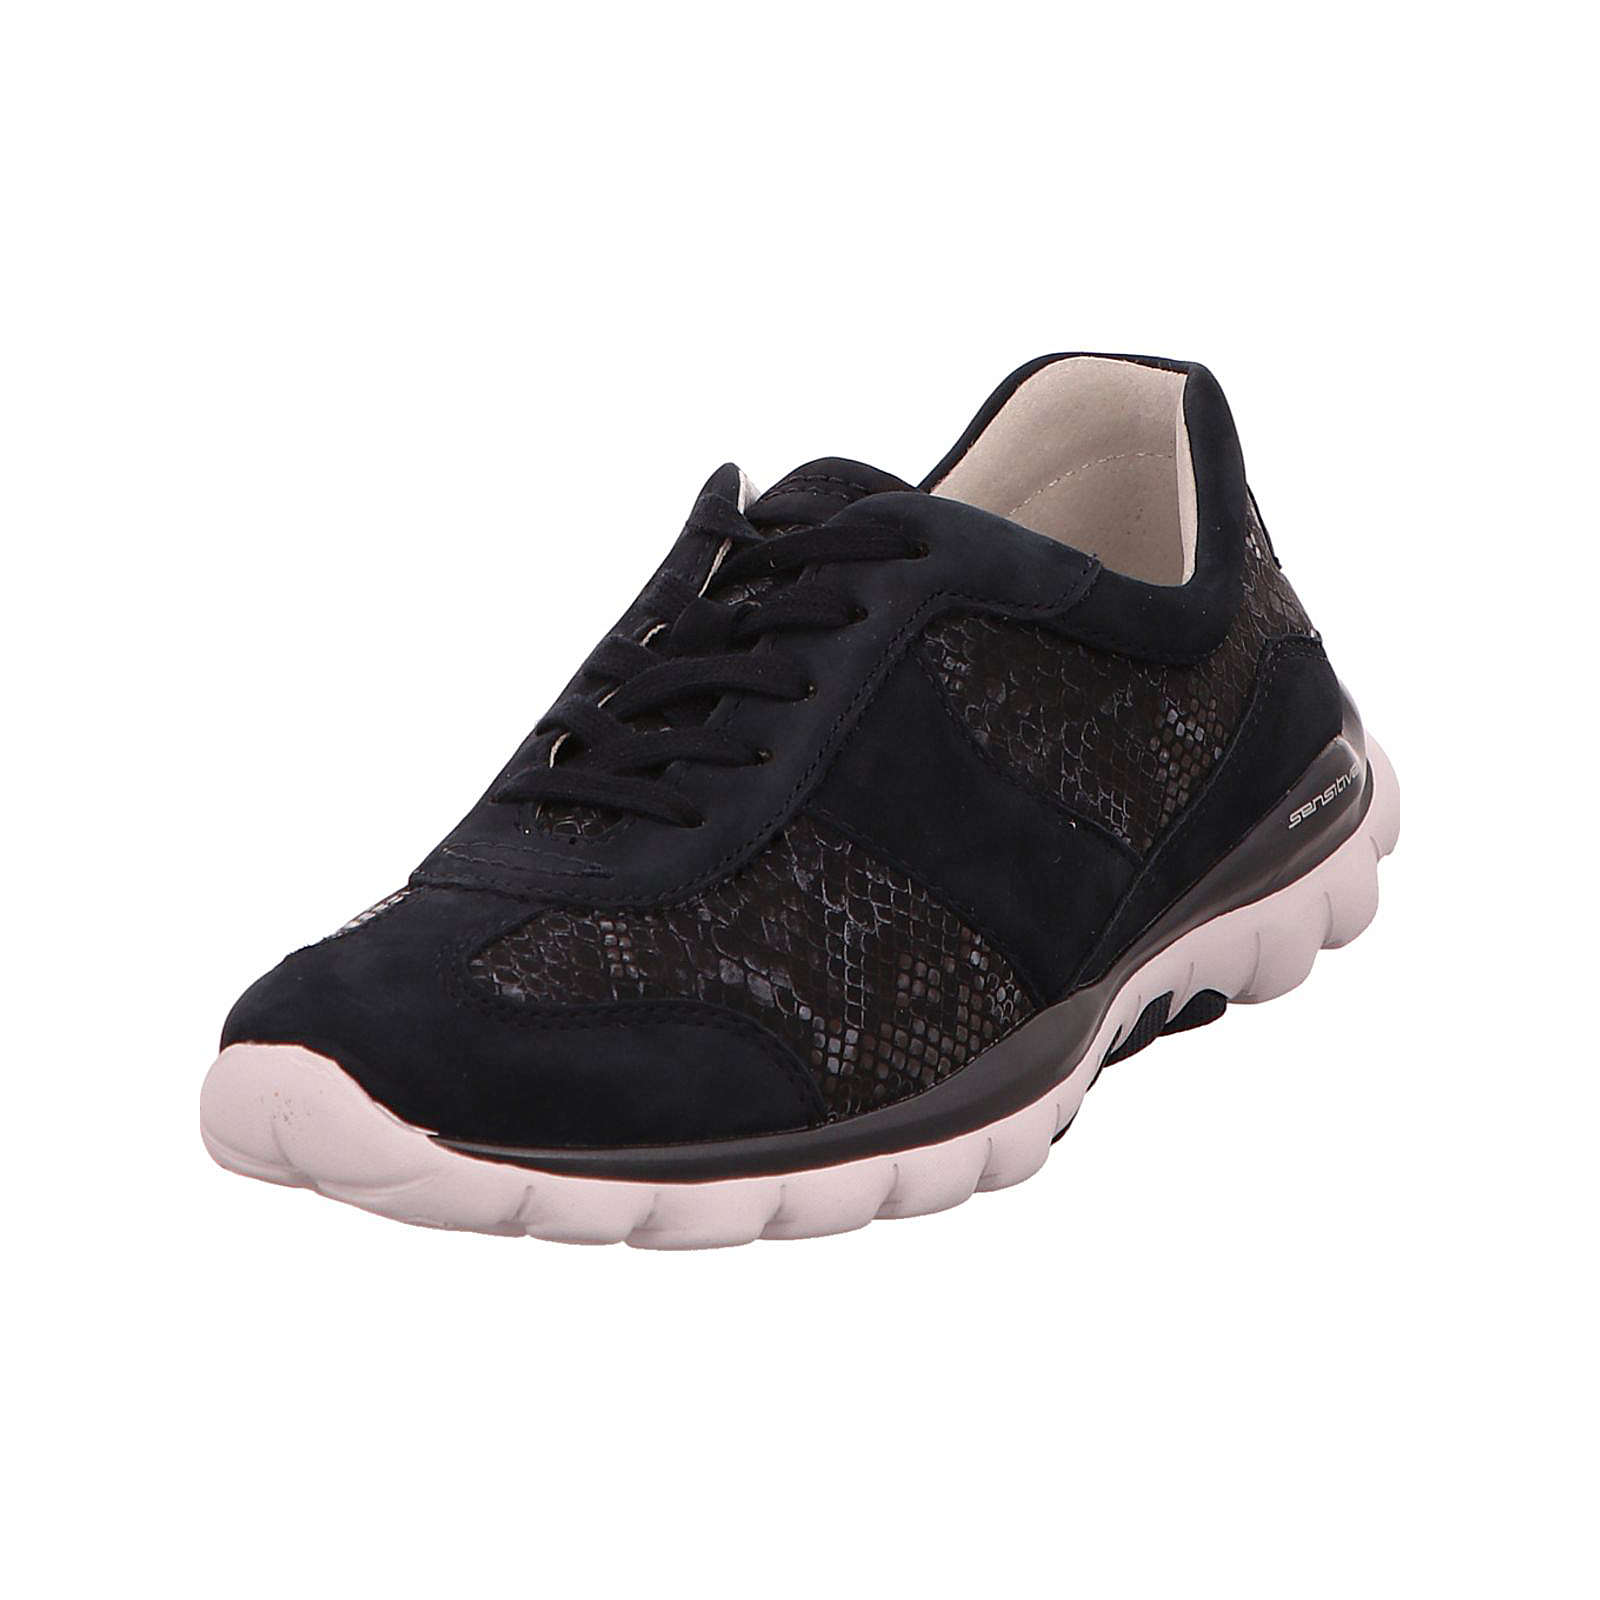 Gabor Sneakers blau blau Damen Gr. 38,5